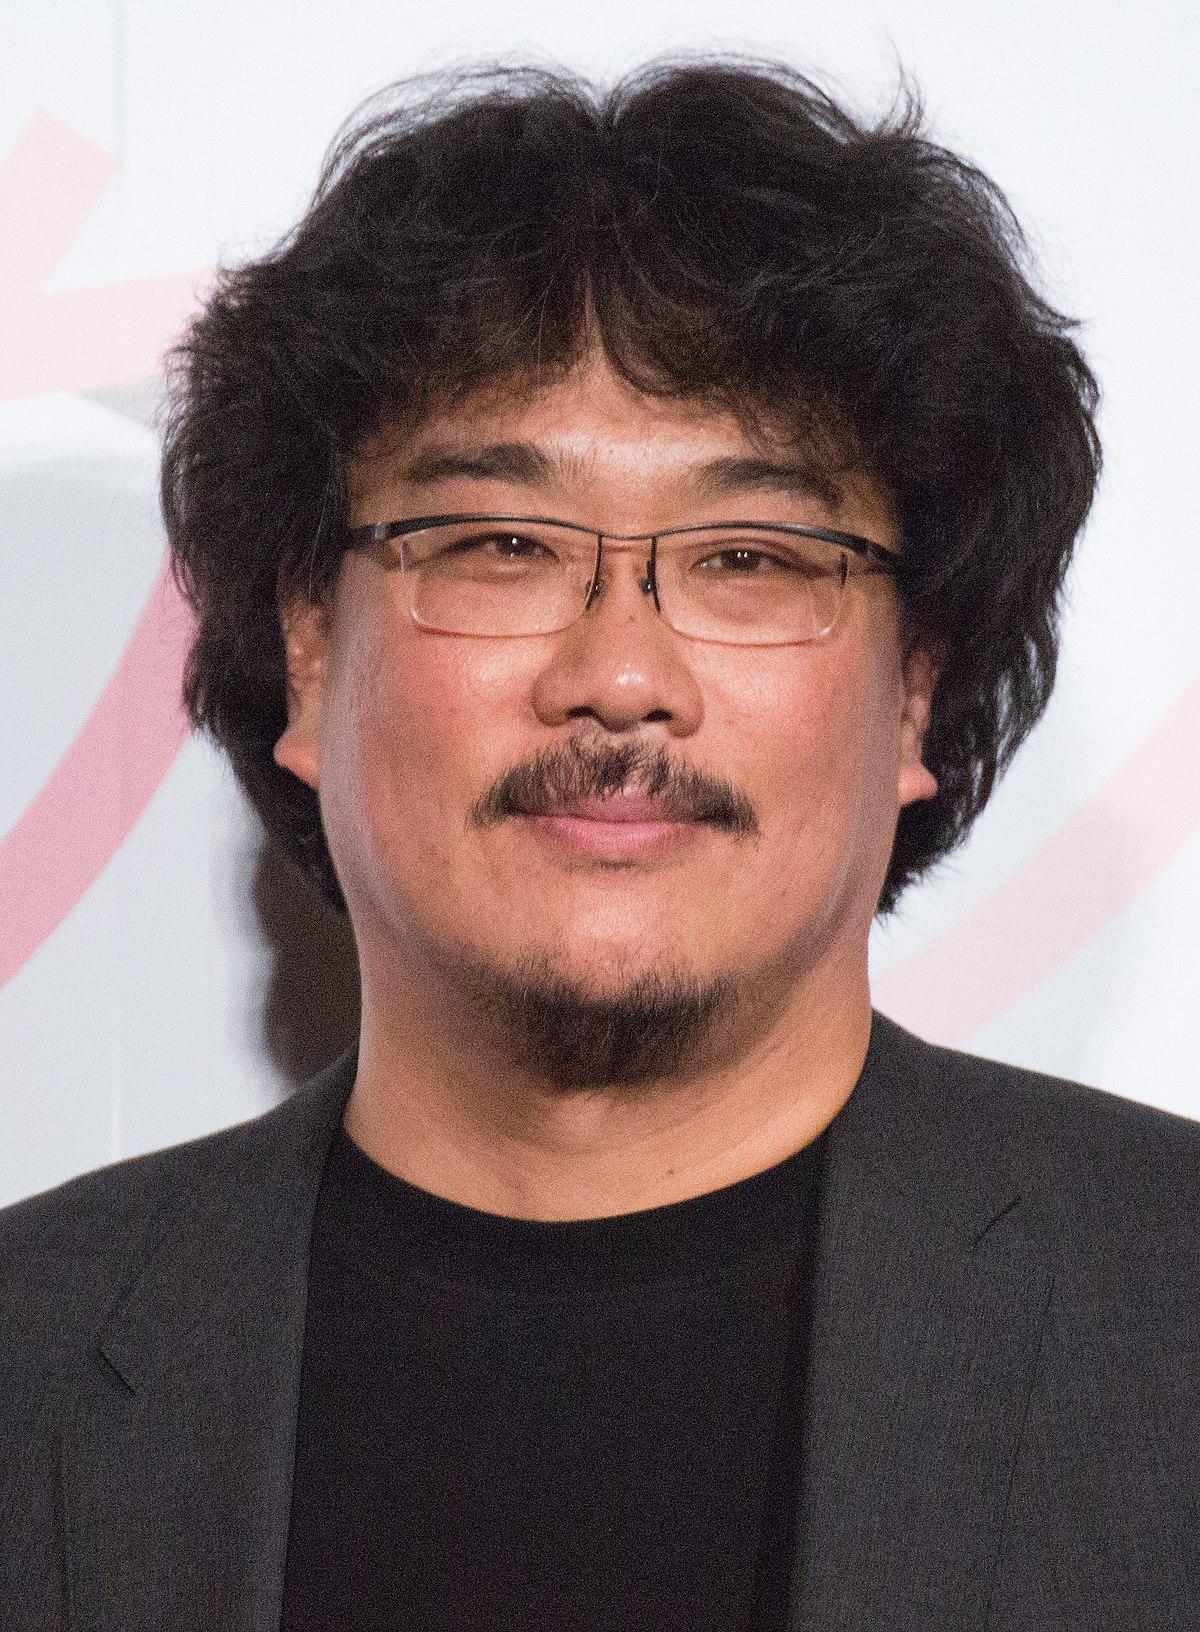 paraziták pong joong ho)